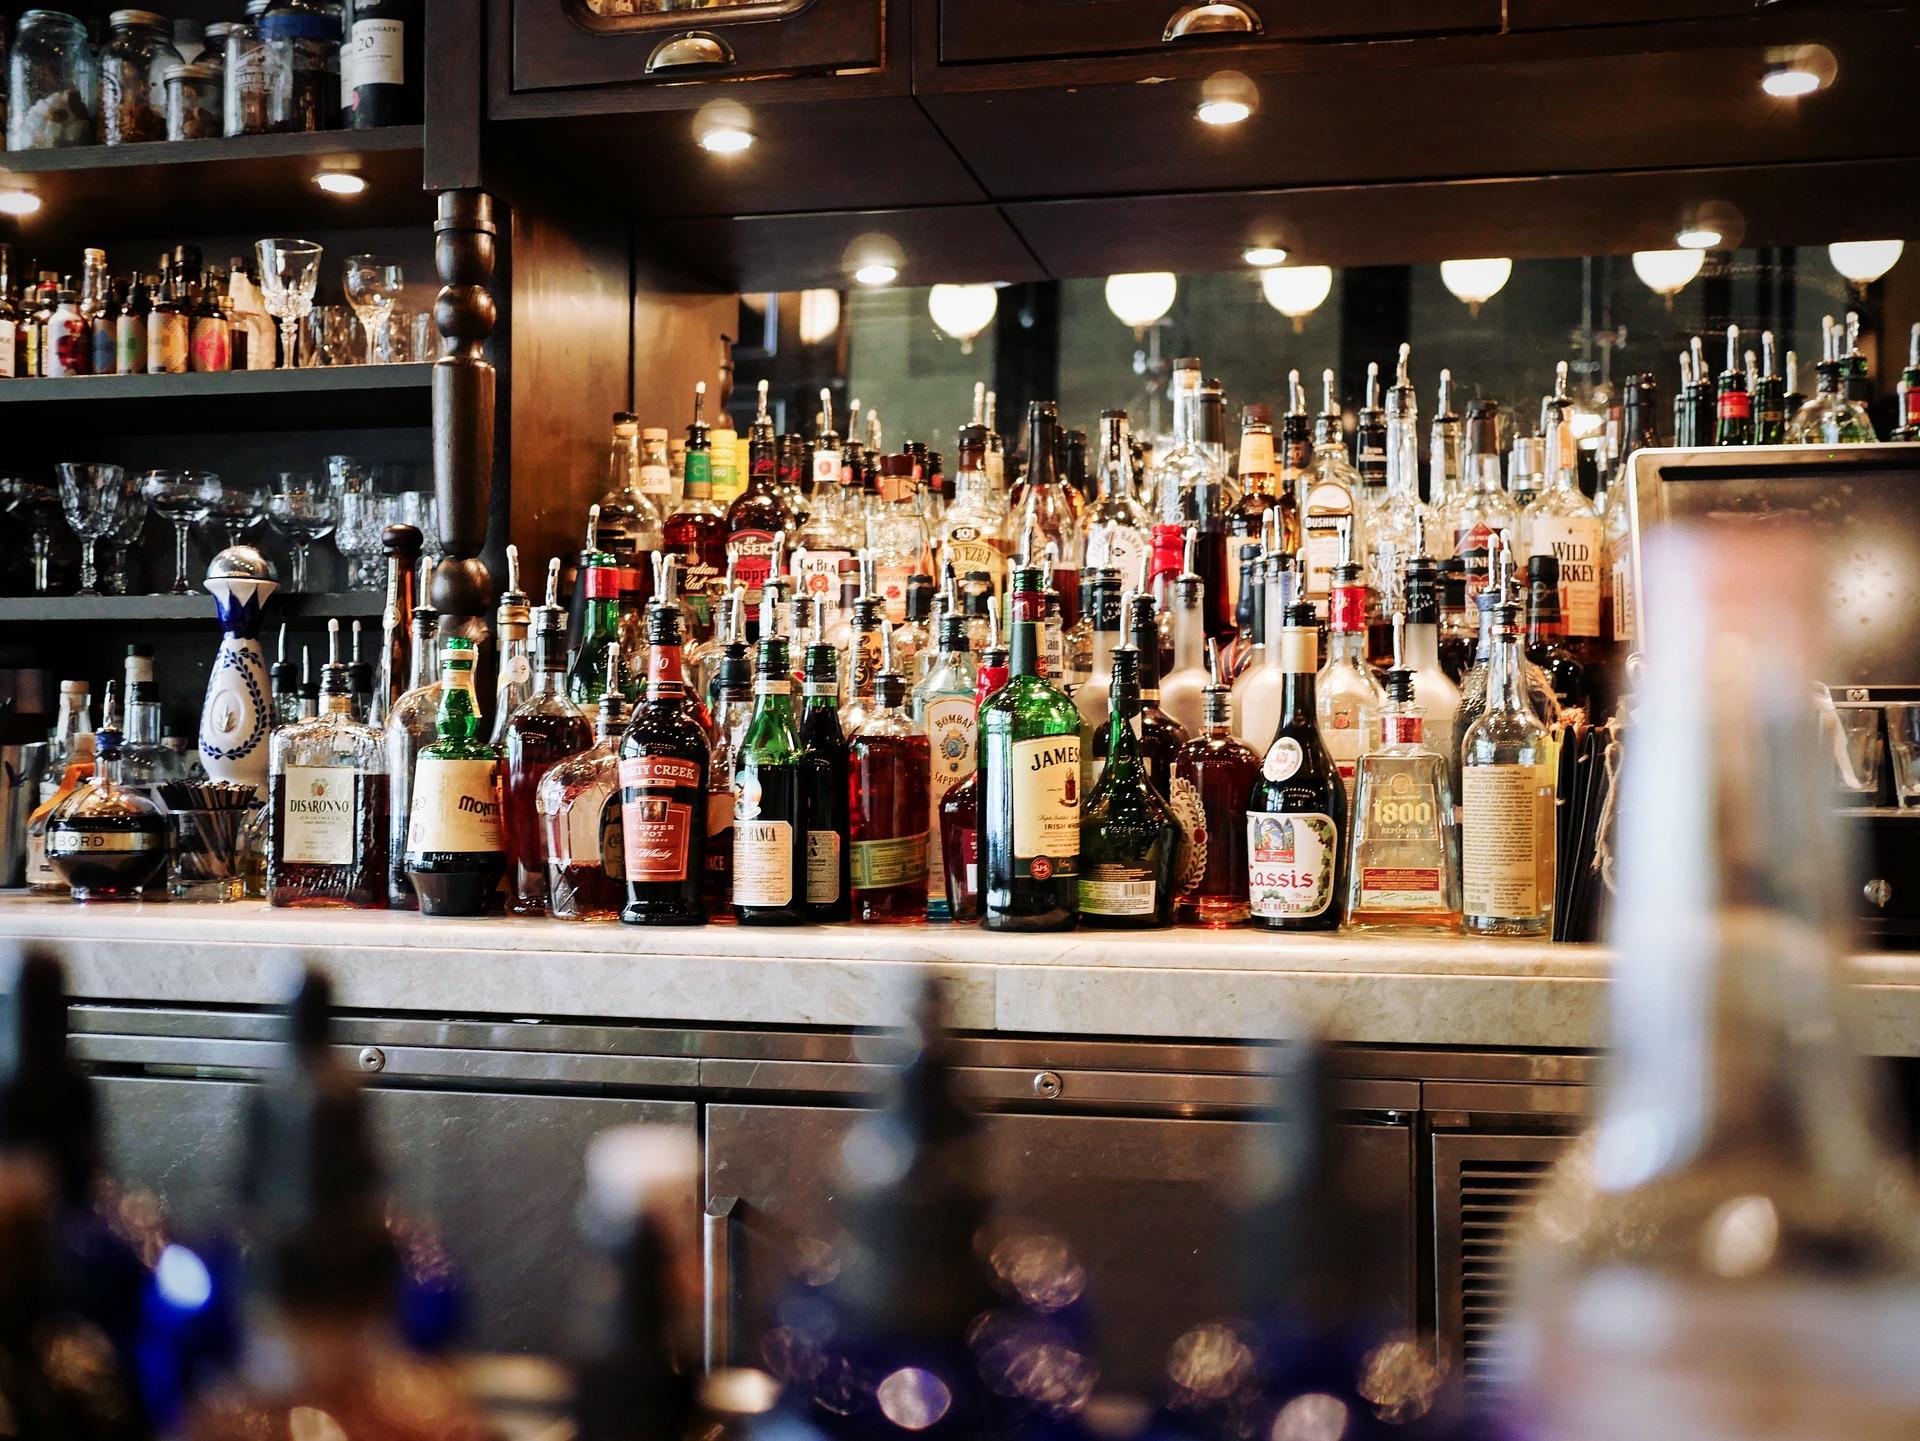 alcoholic-beverages-1845295_1920.jpg